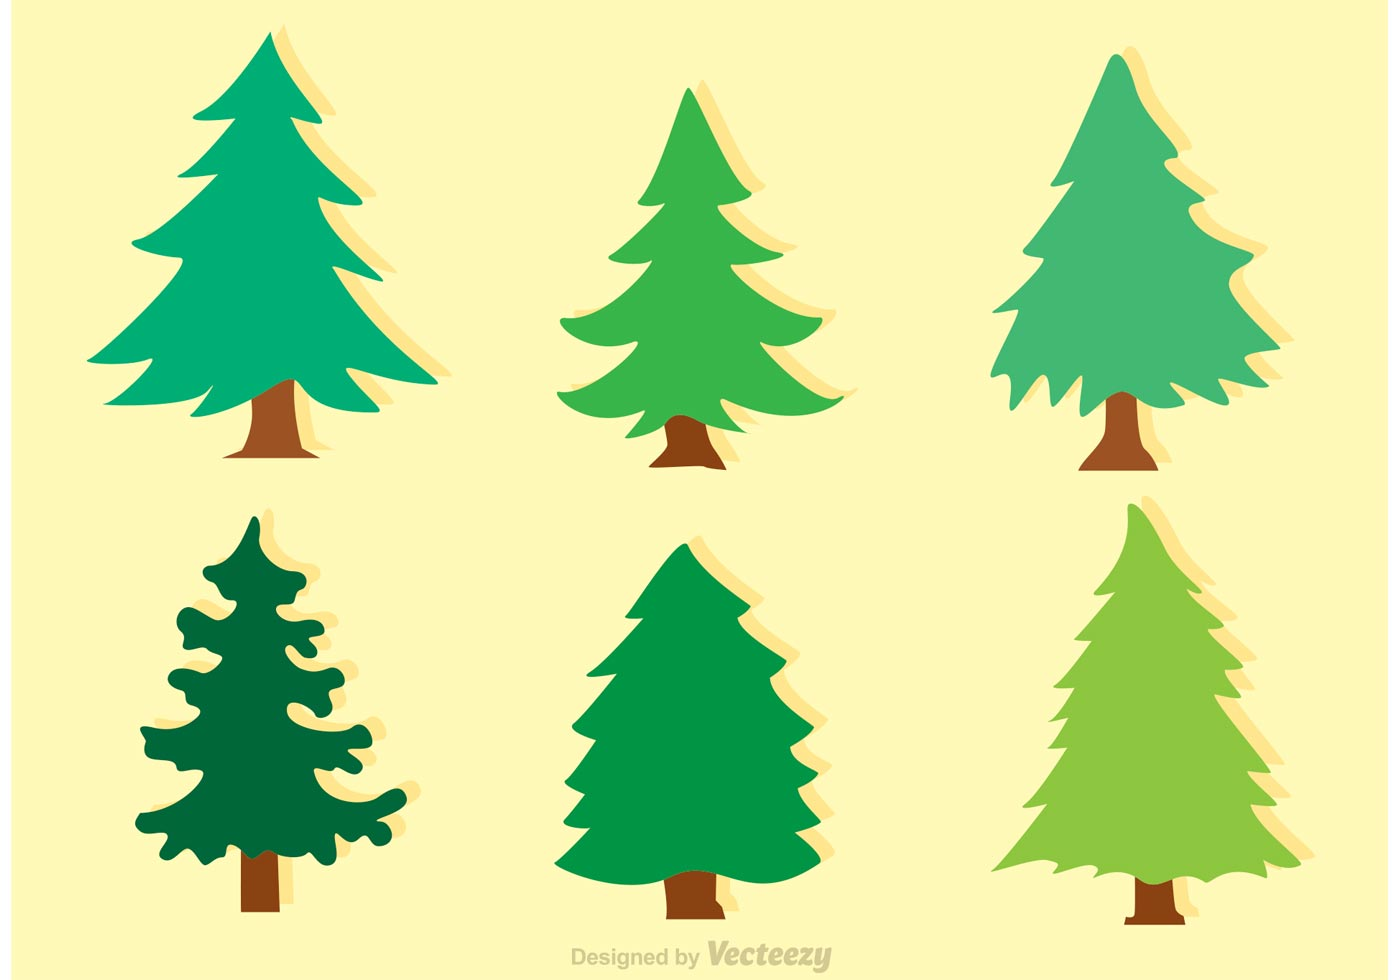 Cedar tree silhouette clipart jpg royalty free stock Cedar Tree Icon Free Vector Art - (31 Free Downloads) jpg royalty free stock